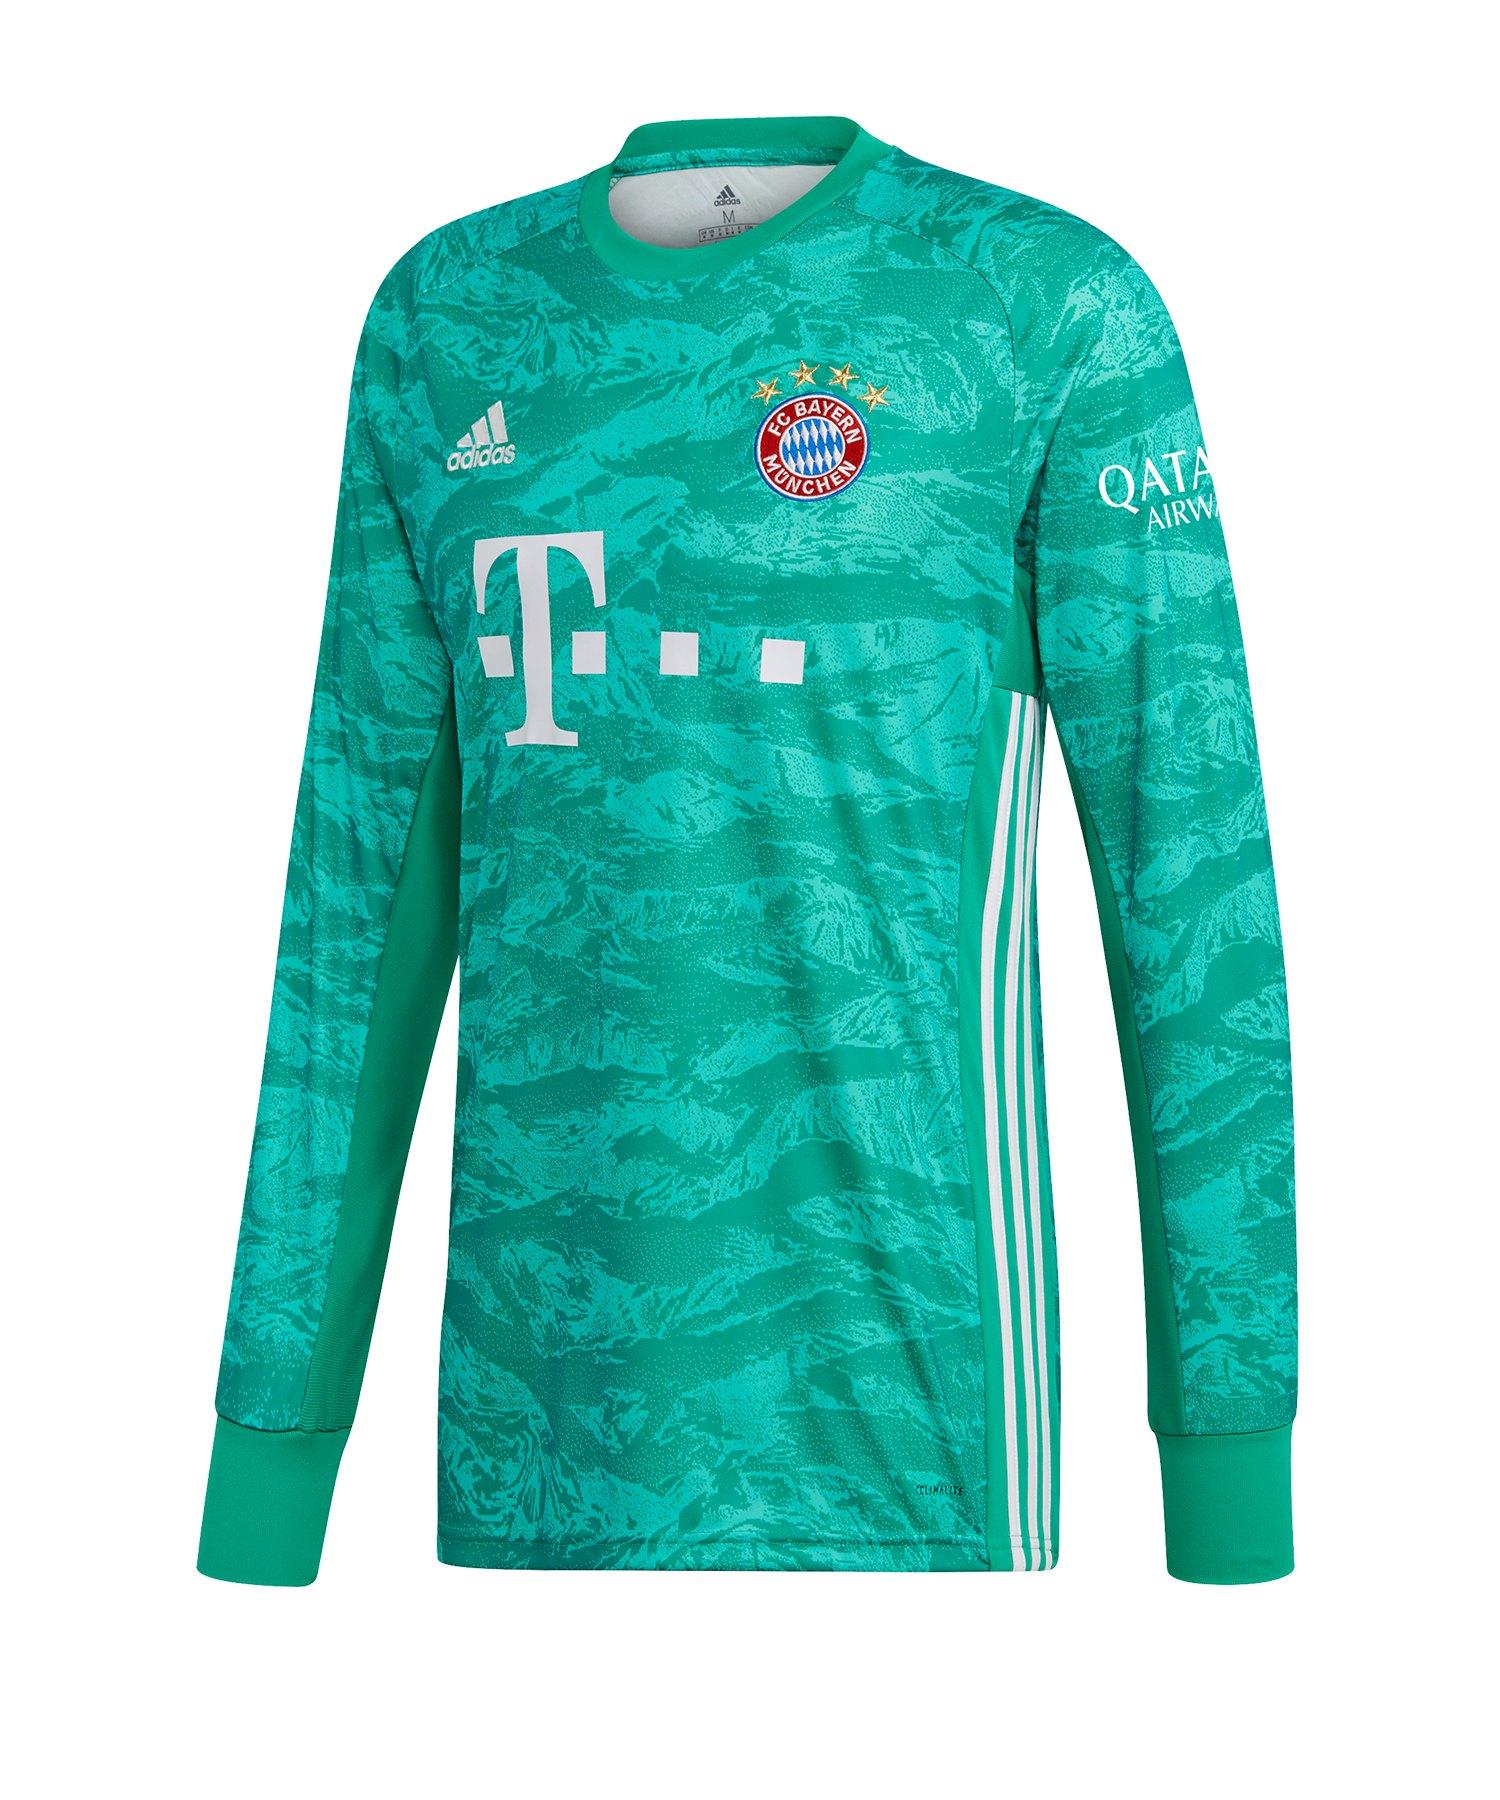 adidas FC Bayern München Torwarttrikot 2019/2020 - Grün